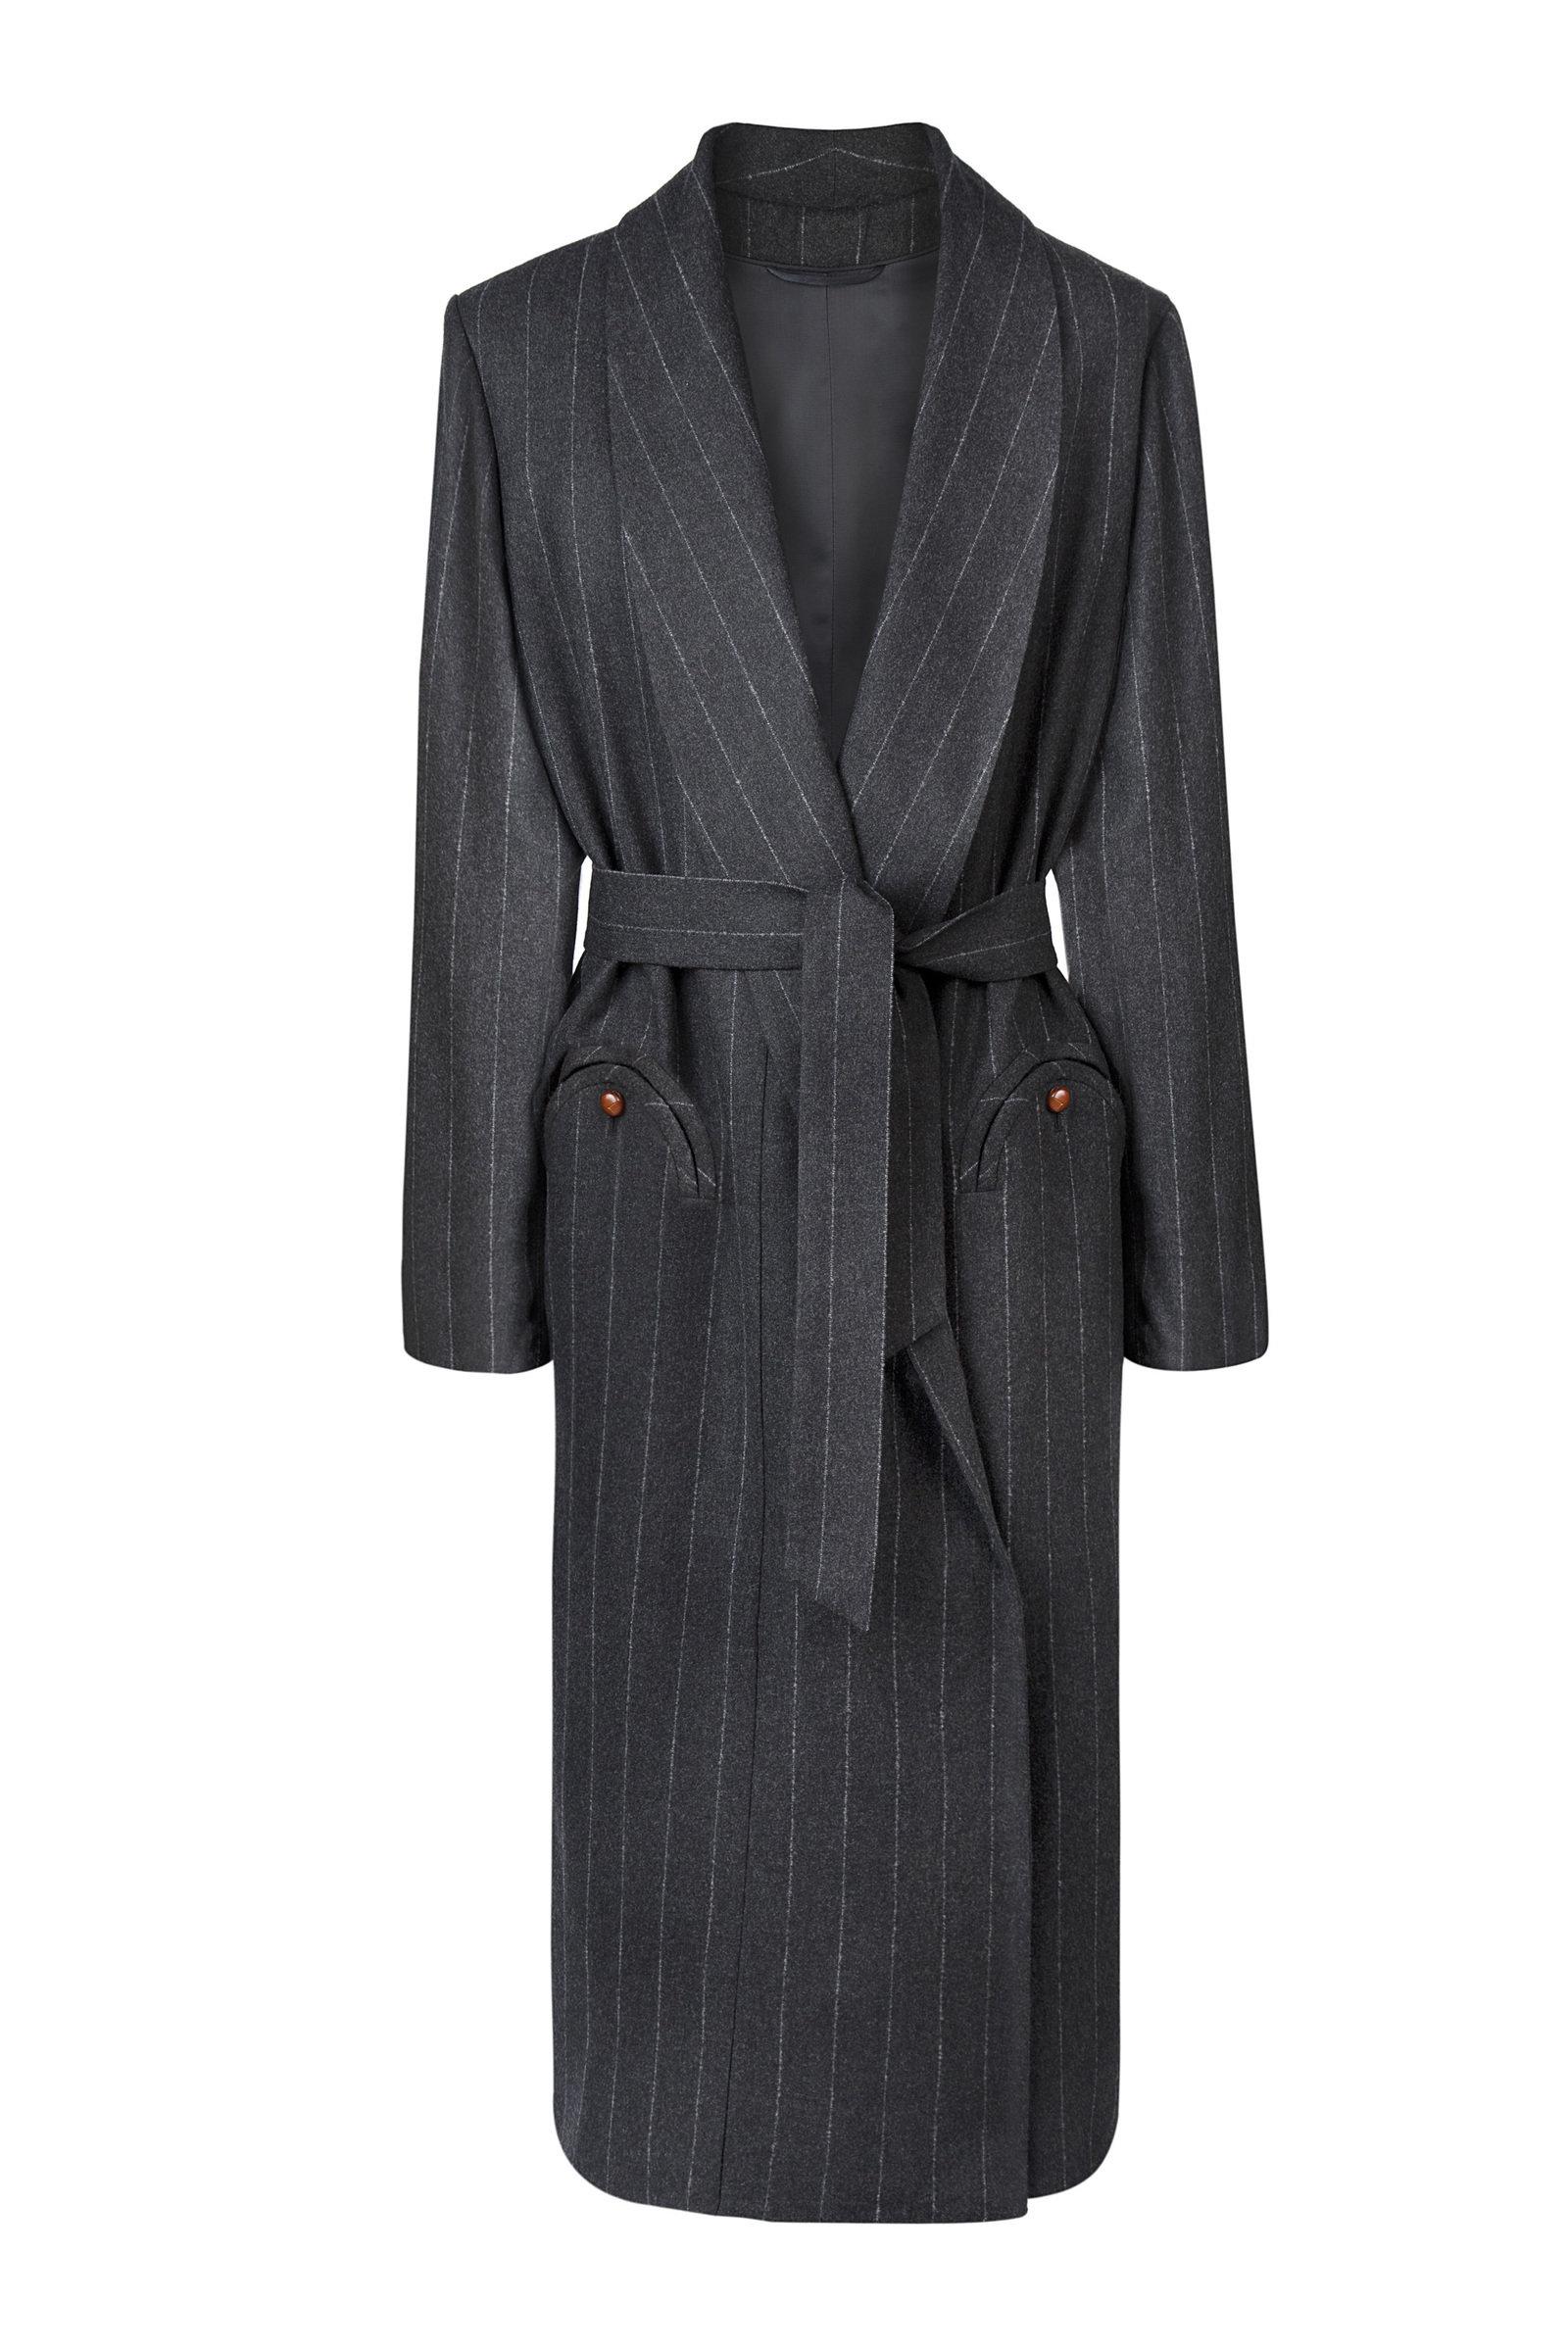 Women's Ferien Whistler Pinstriped Wool-Cashmere Coat